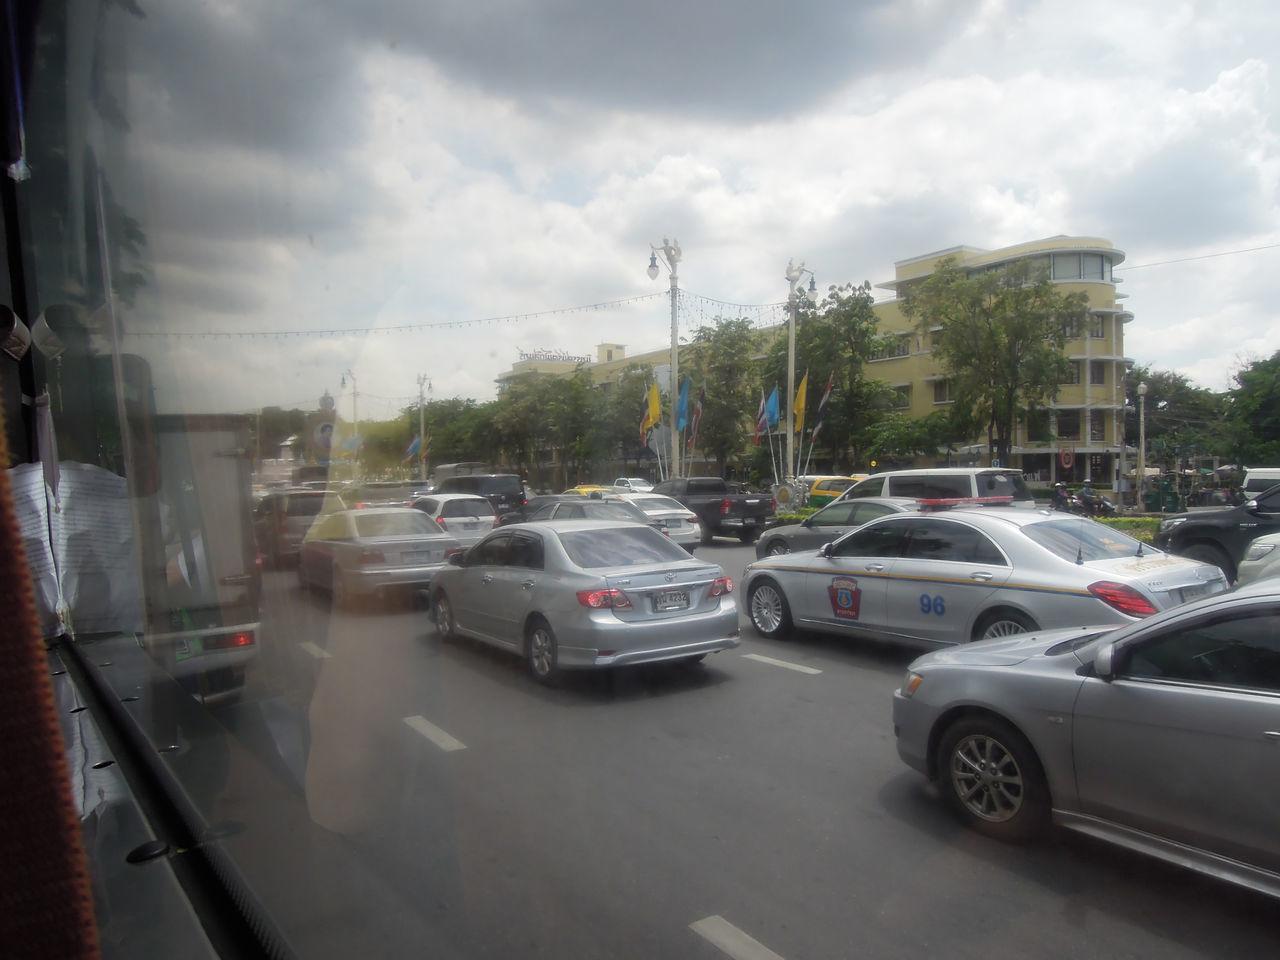 bus window photo on the road in bangkok Bangkok Bus Bus View Bus Window Car City City Life Metropolis Road Street Thailand Traffic Traffic Jam View